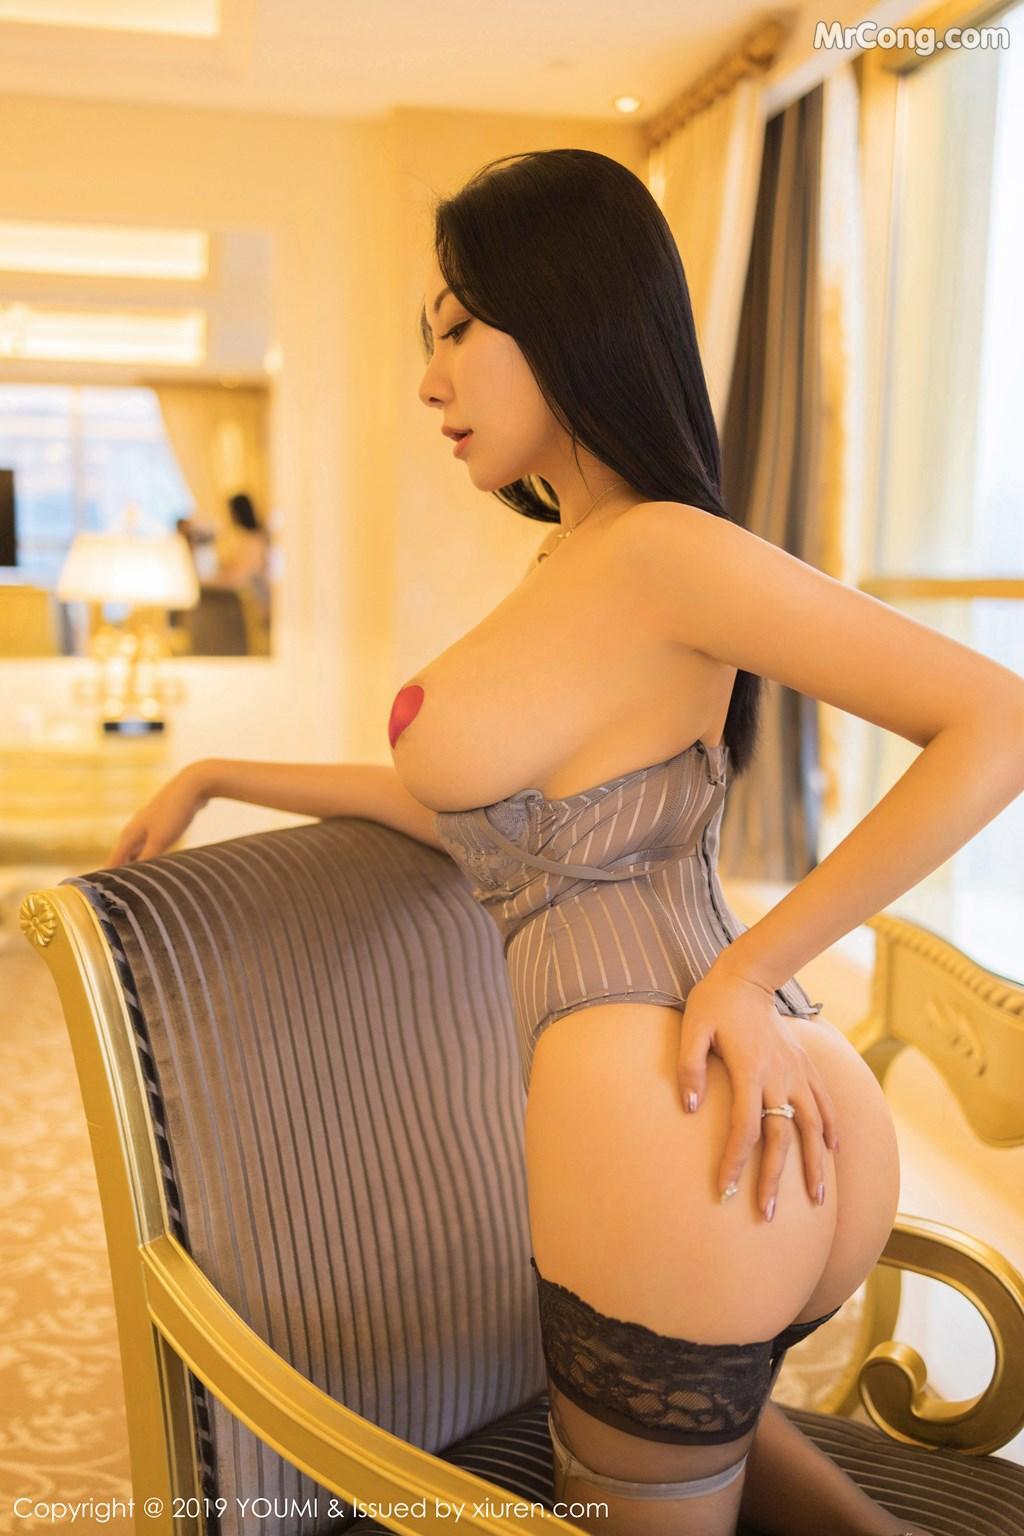 YouMi Vol.393: Victoria (果 儿) (46 pictures)